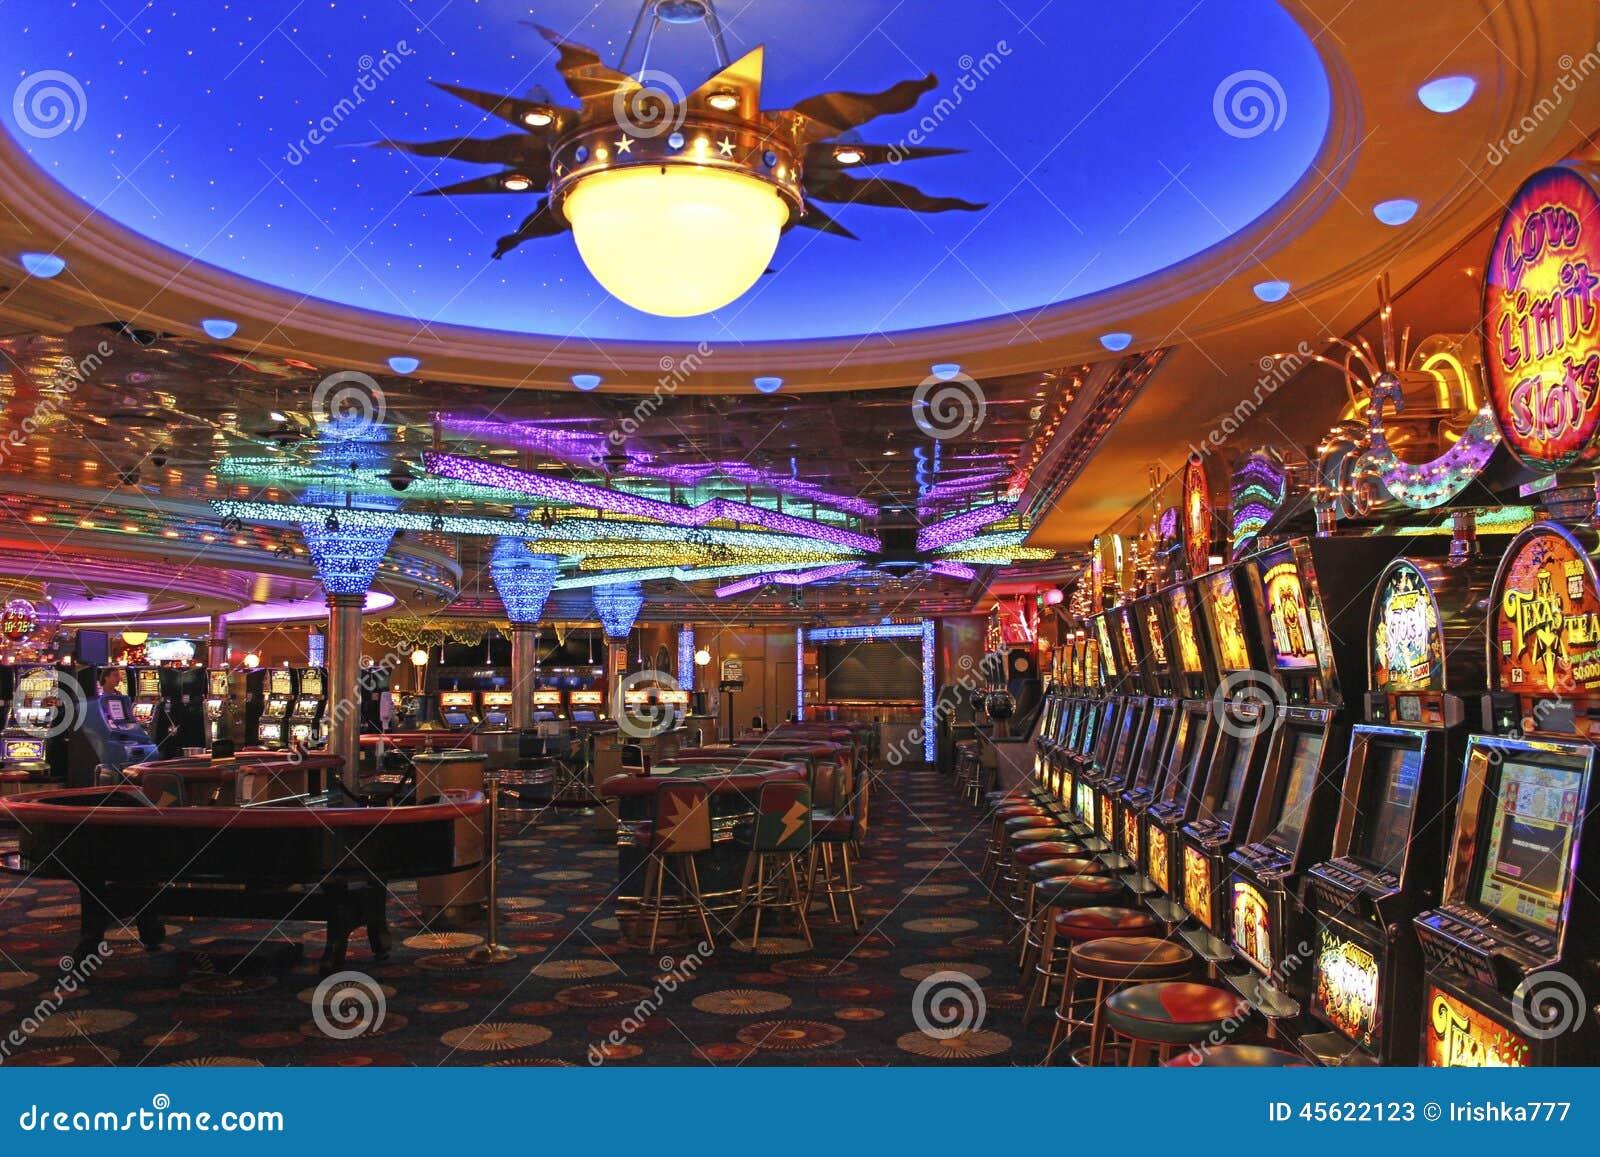 royal caribbean casino players club